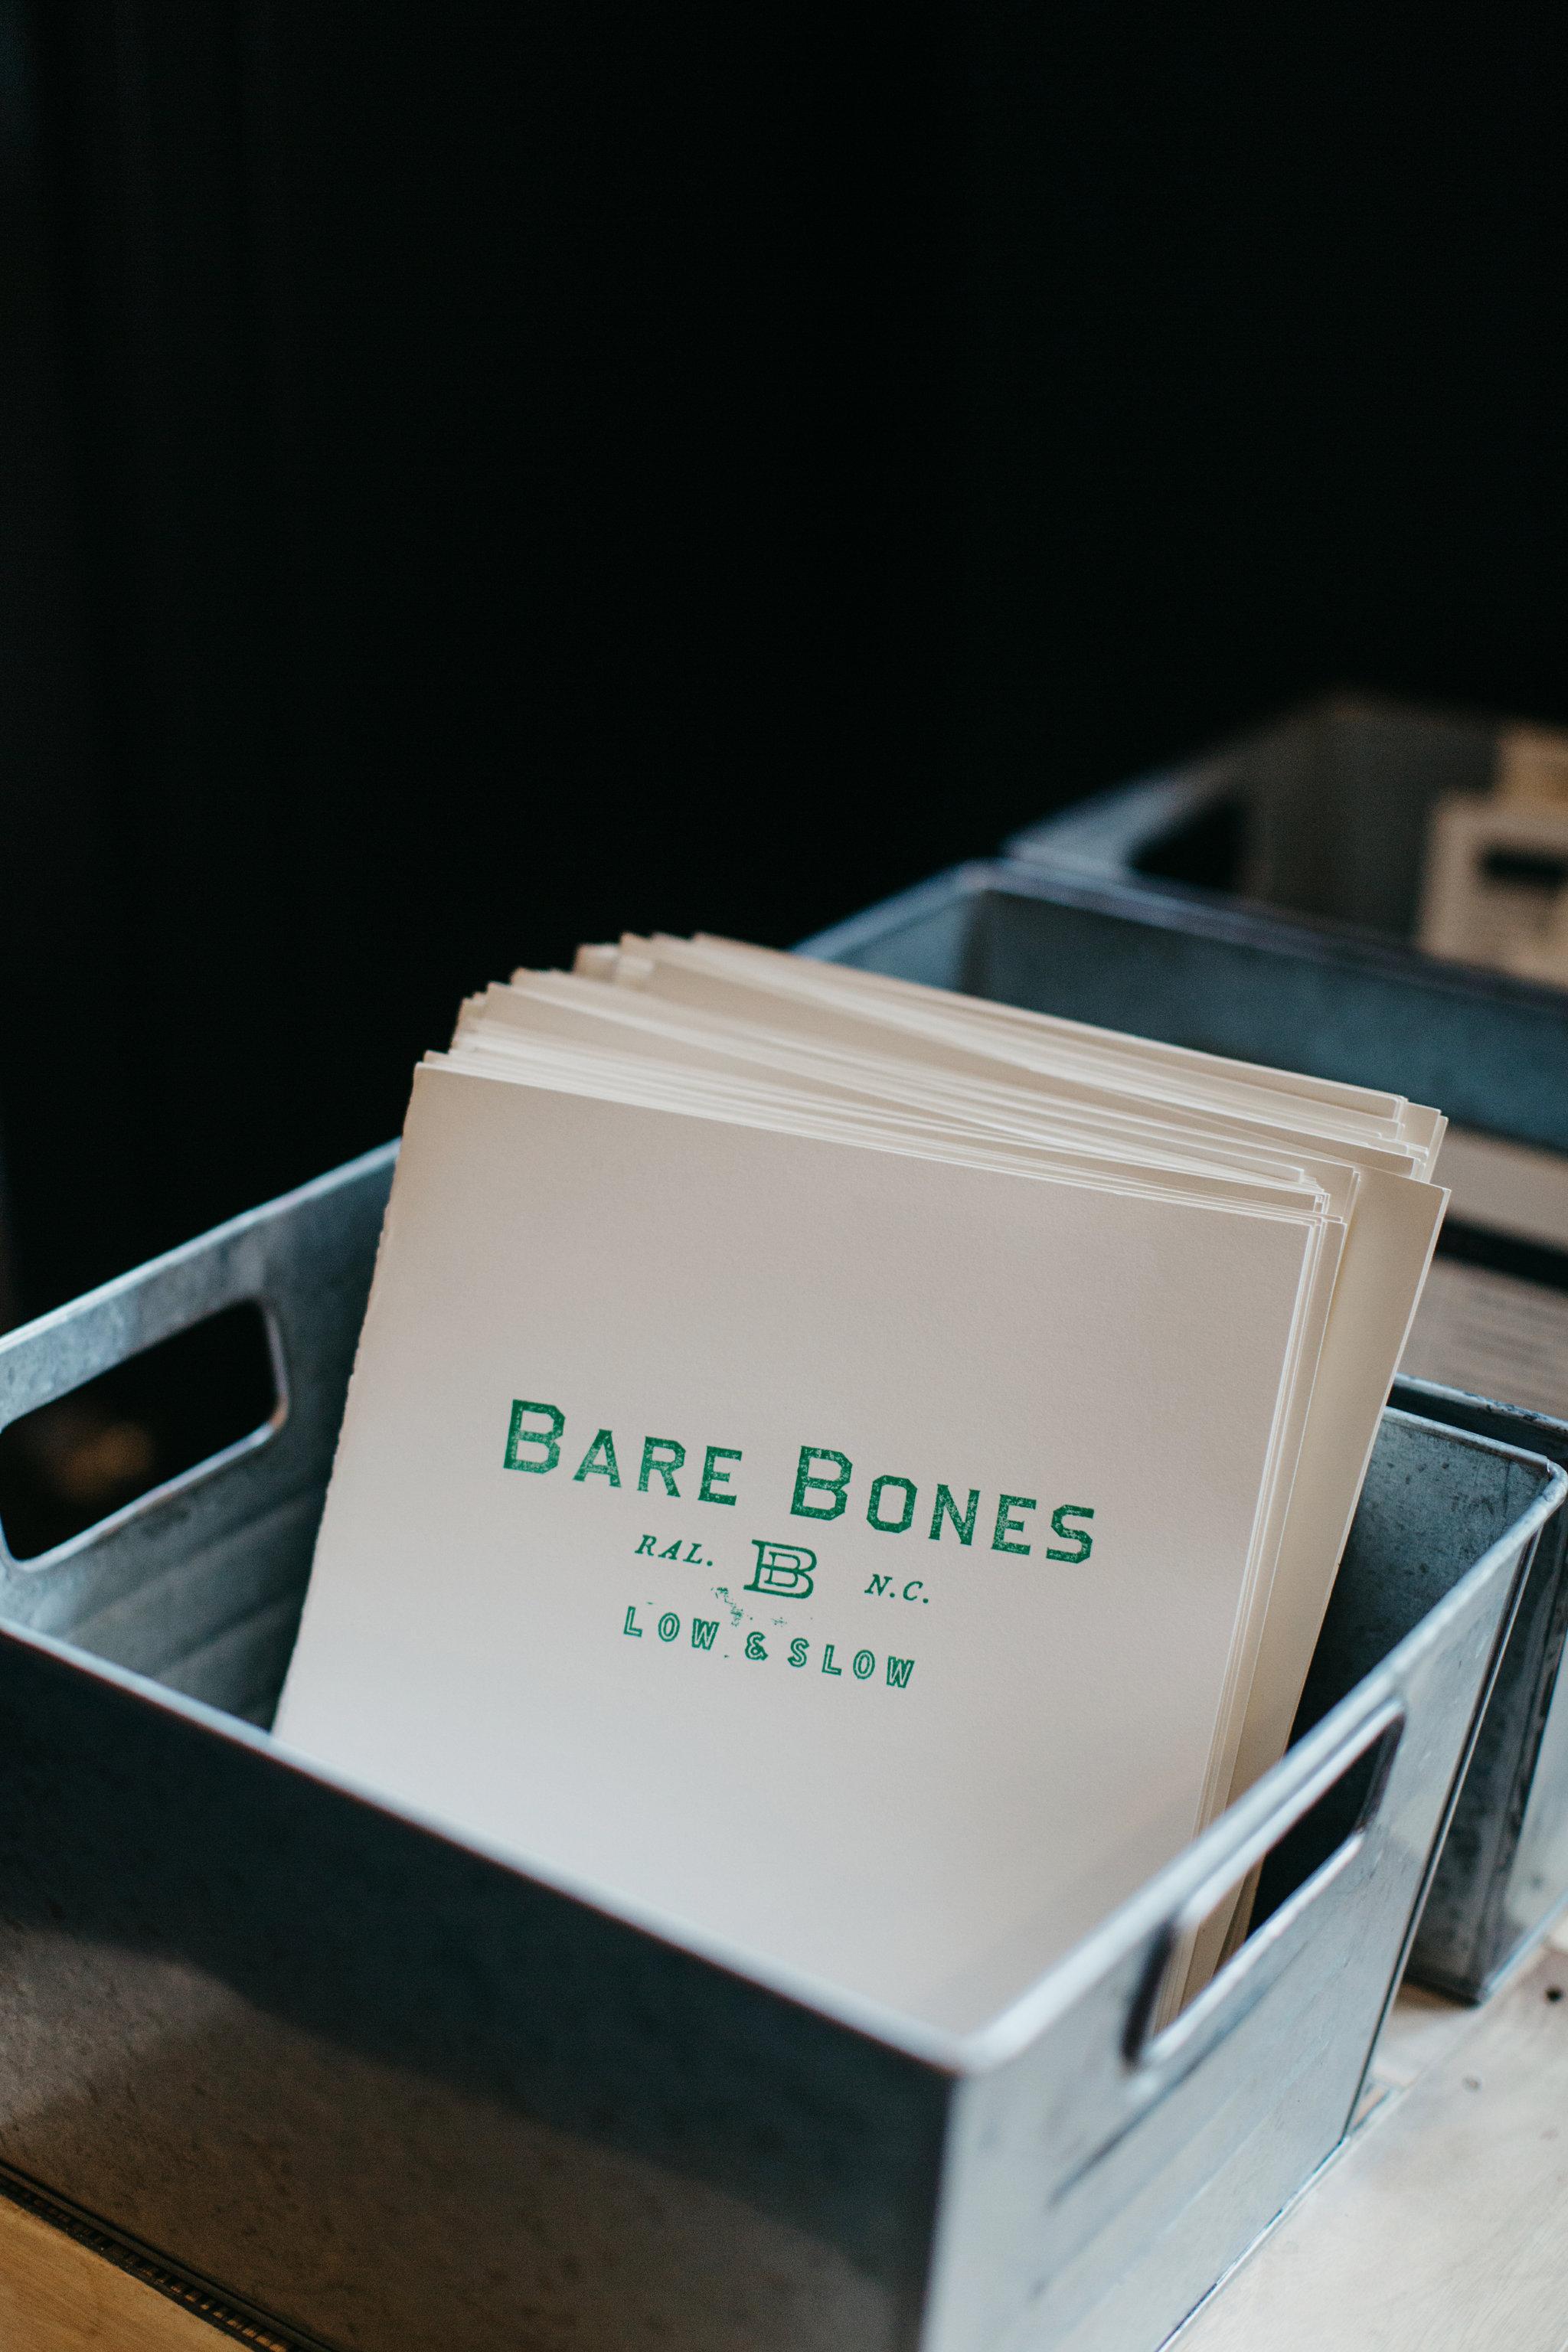 Design by Good South / Bare Bones Identity - Menu Application